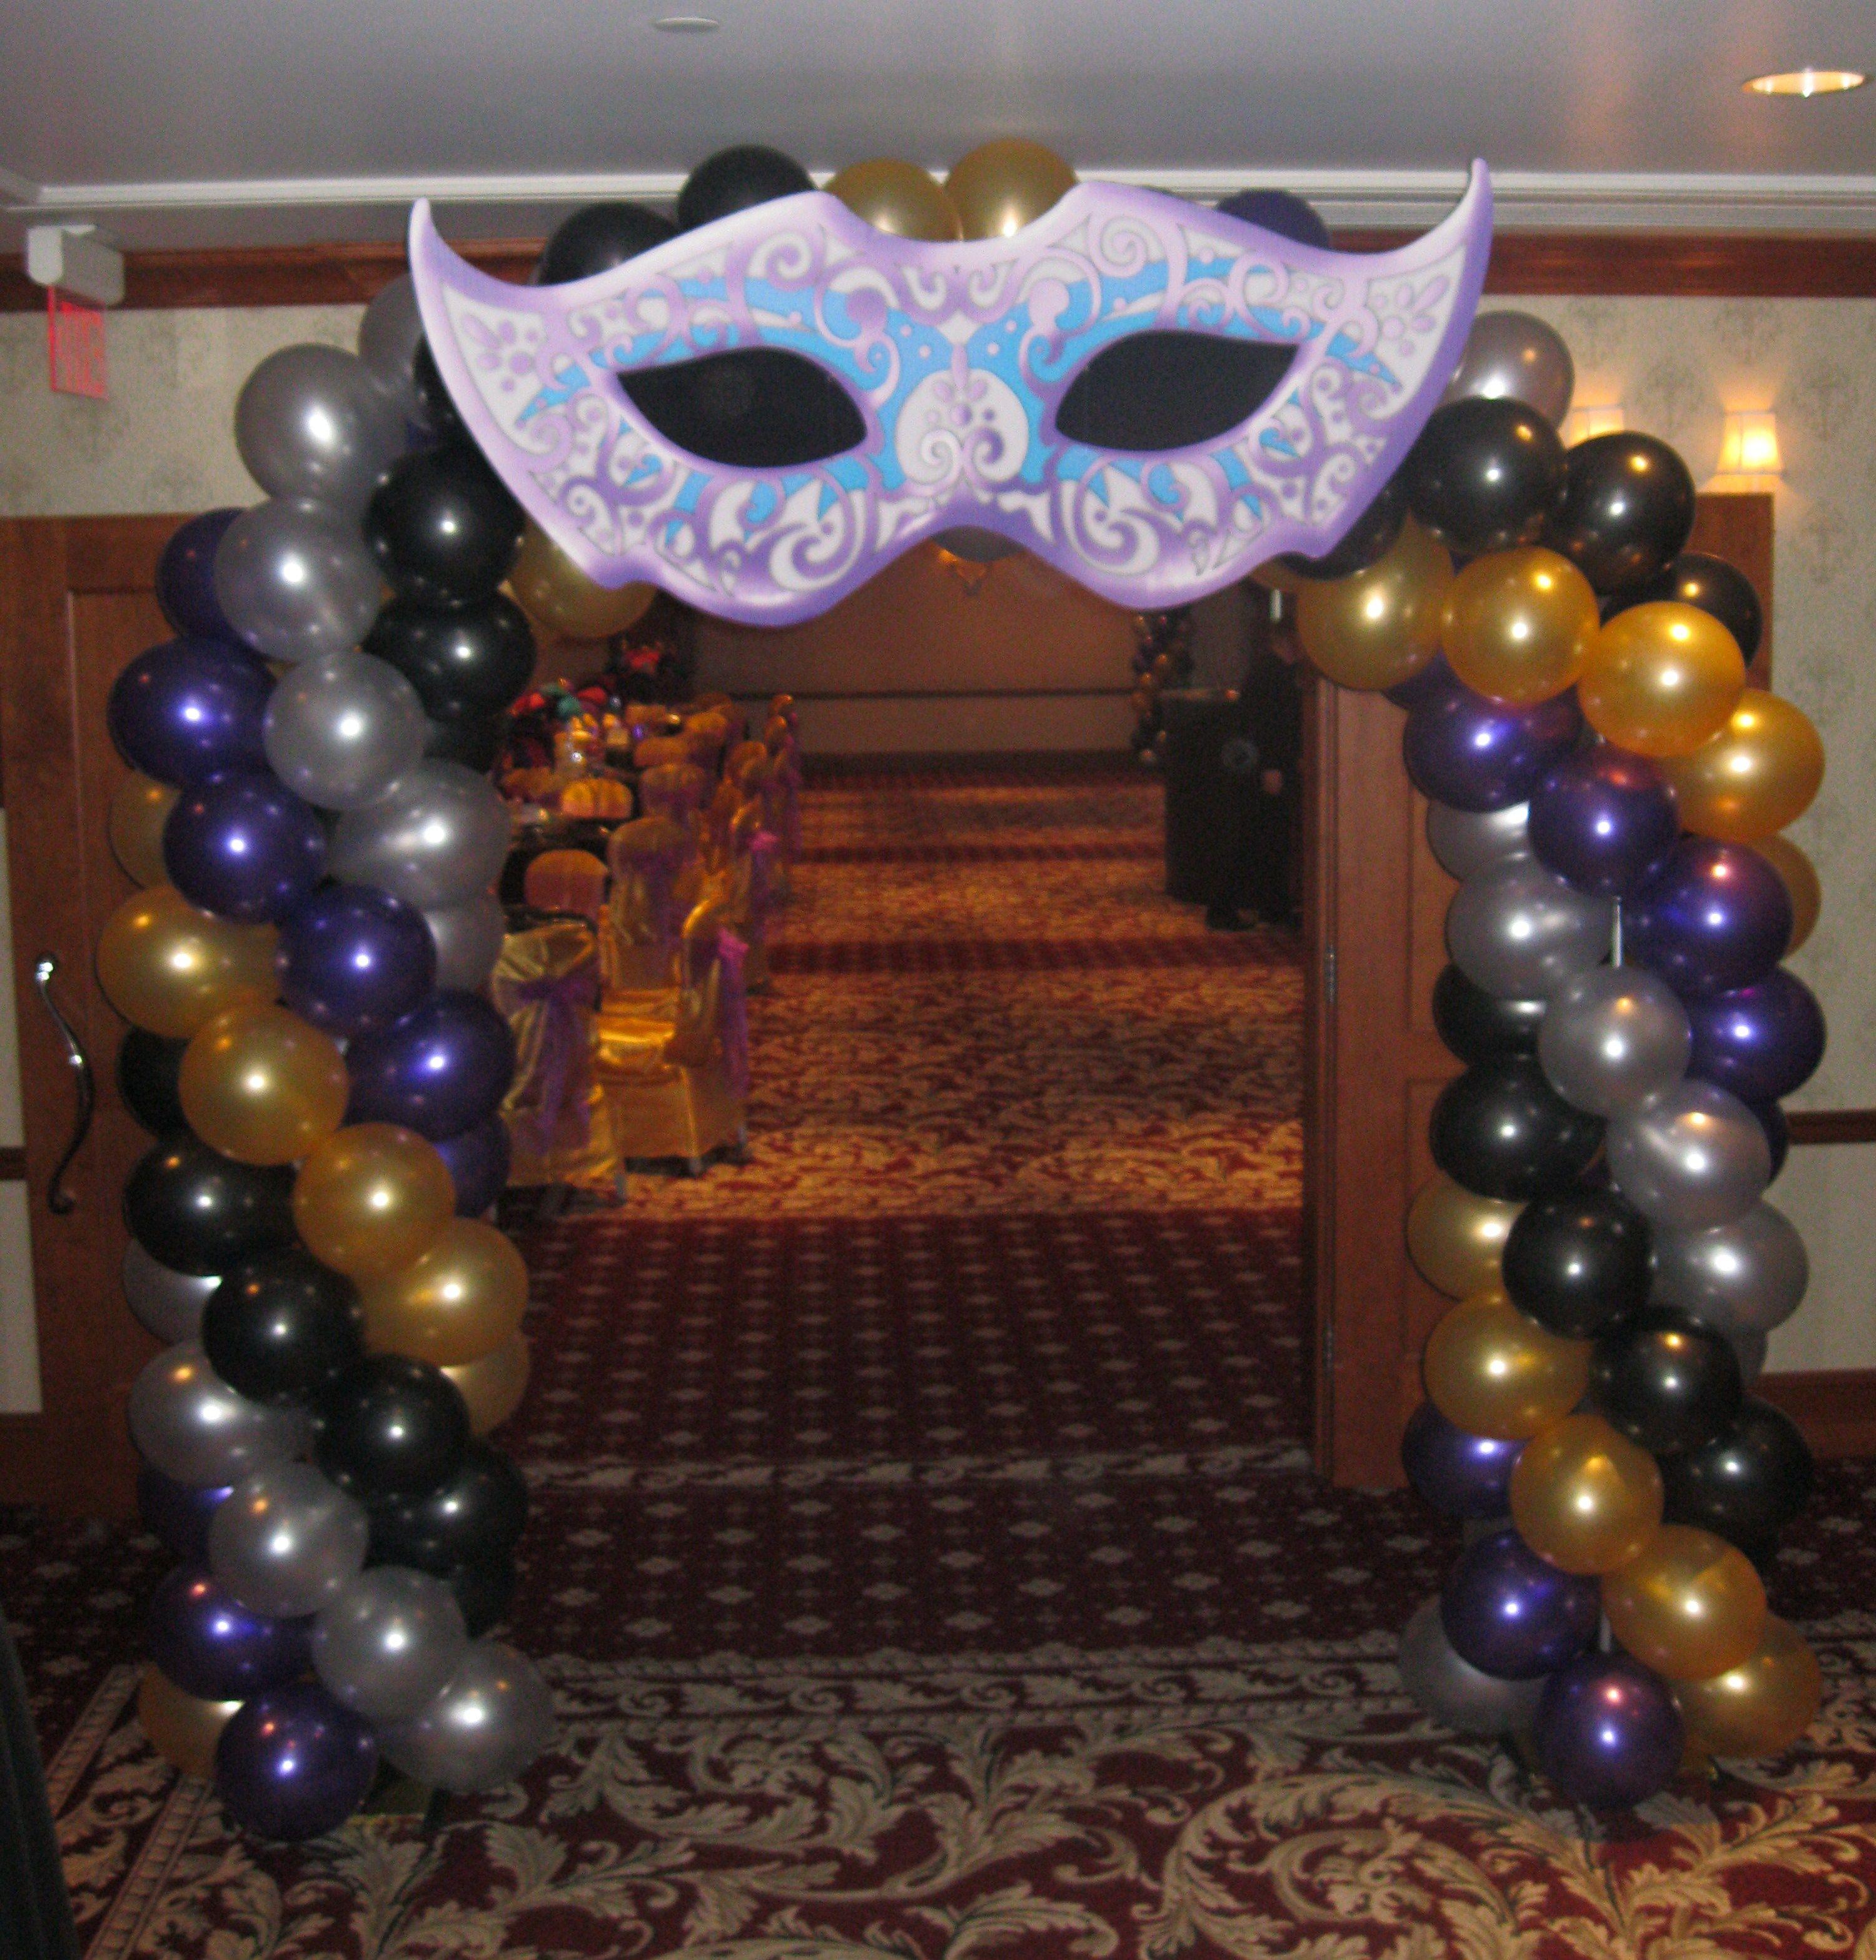 Walk through entrance mask balloon arch created by